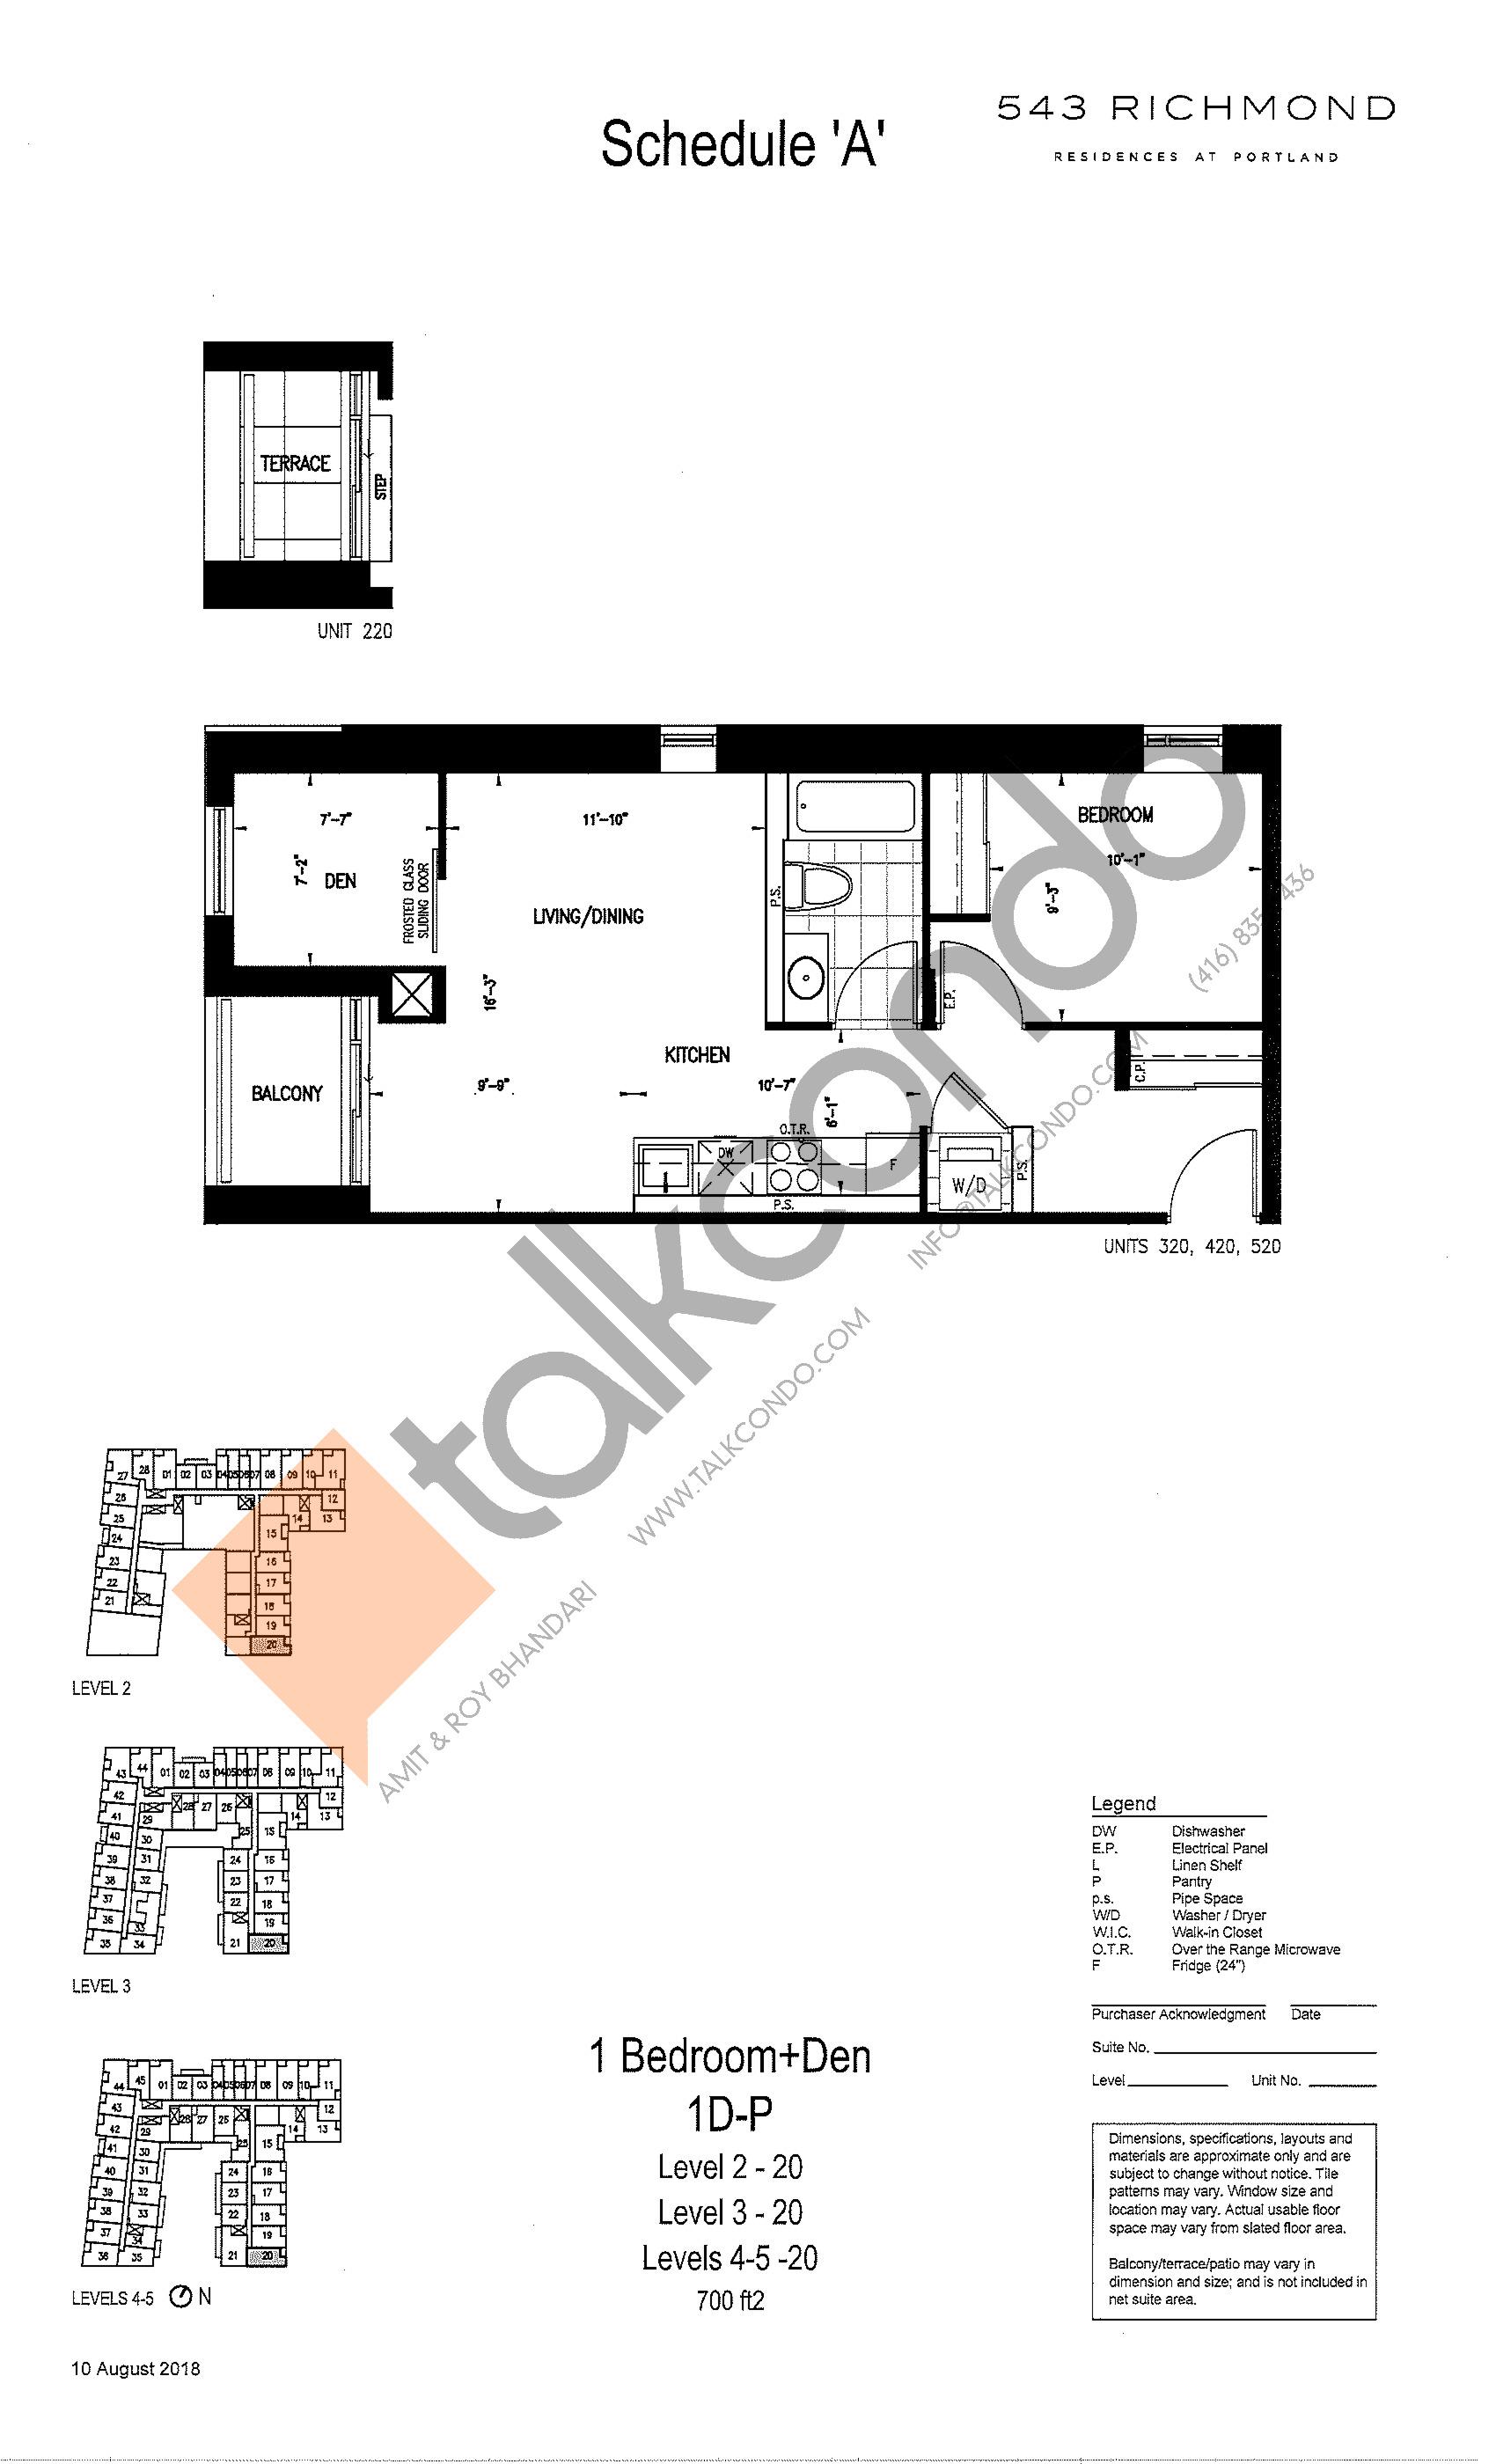 1D-P Floor Plan at 543 Richmond St Condos - 700 sq.ft